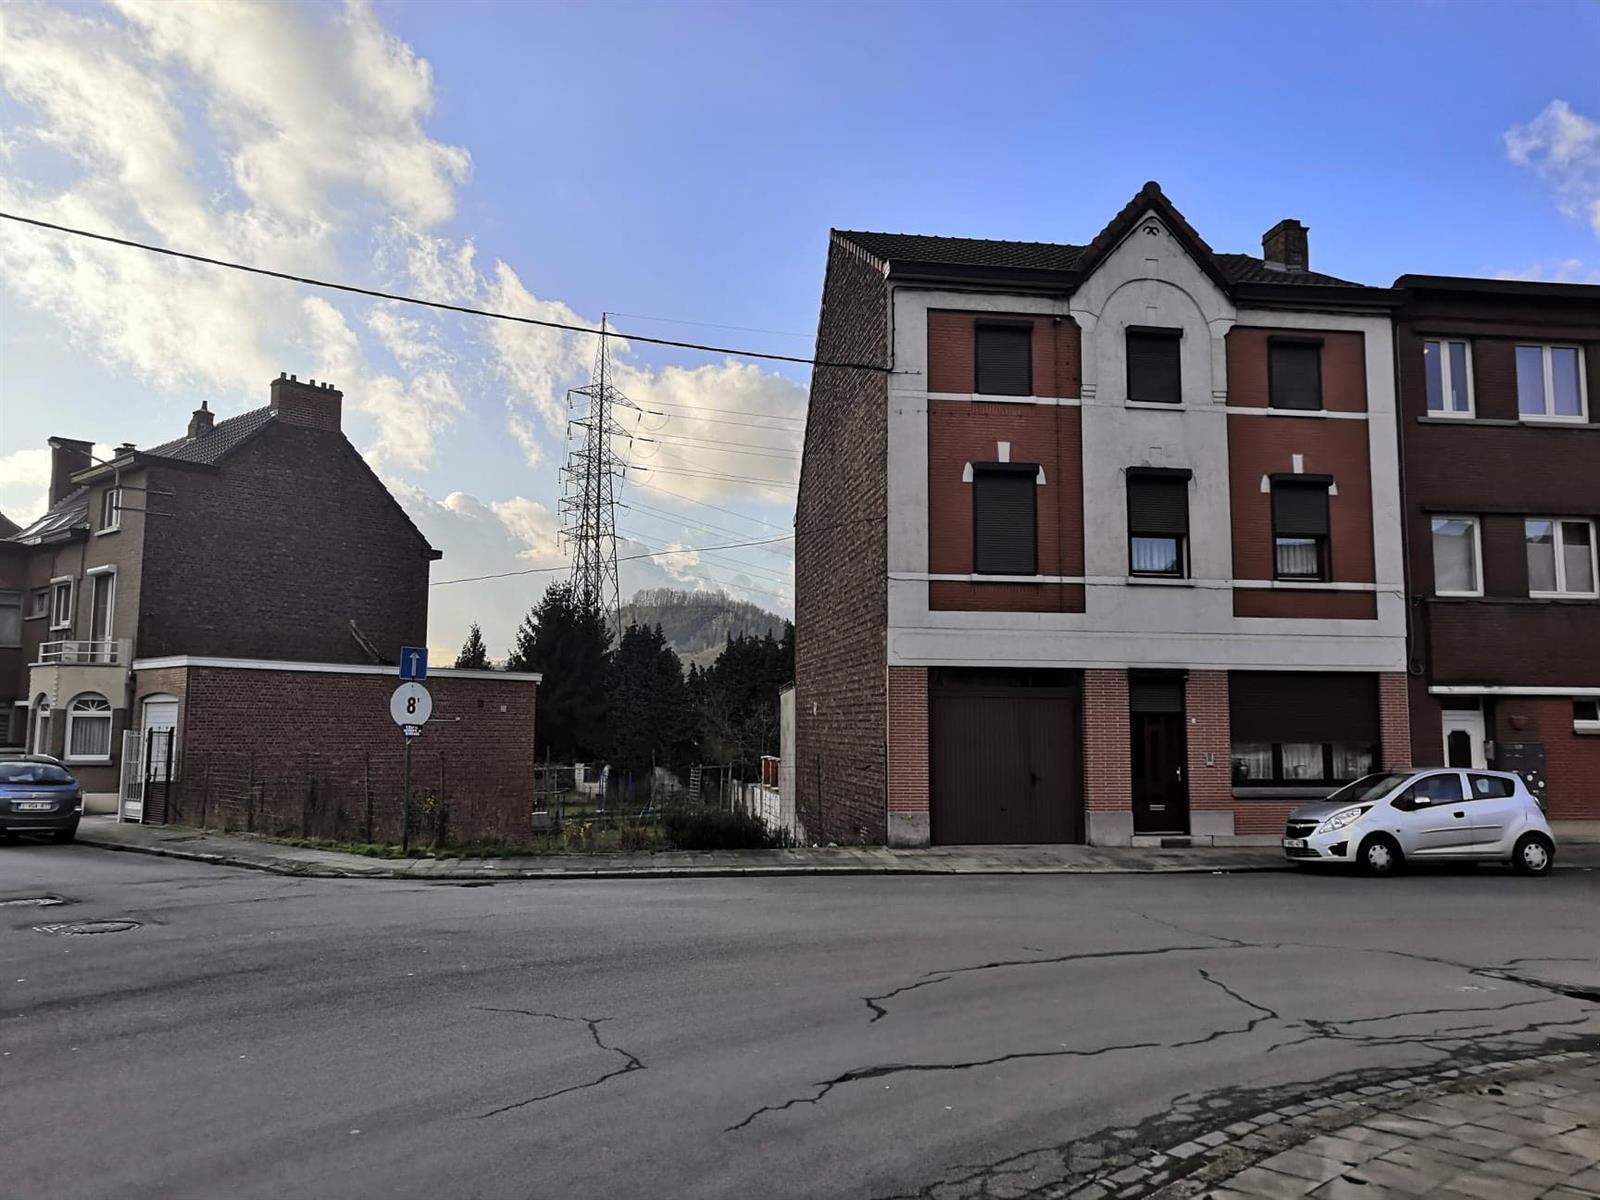 Terrain à bâtir (projets) - Charleroi - #3957840-1